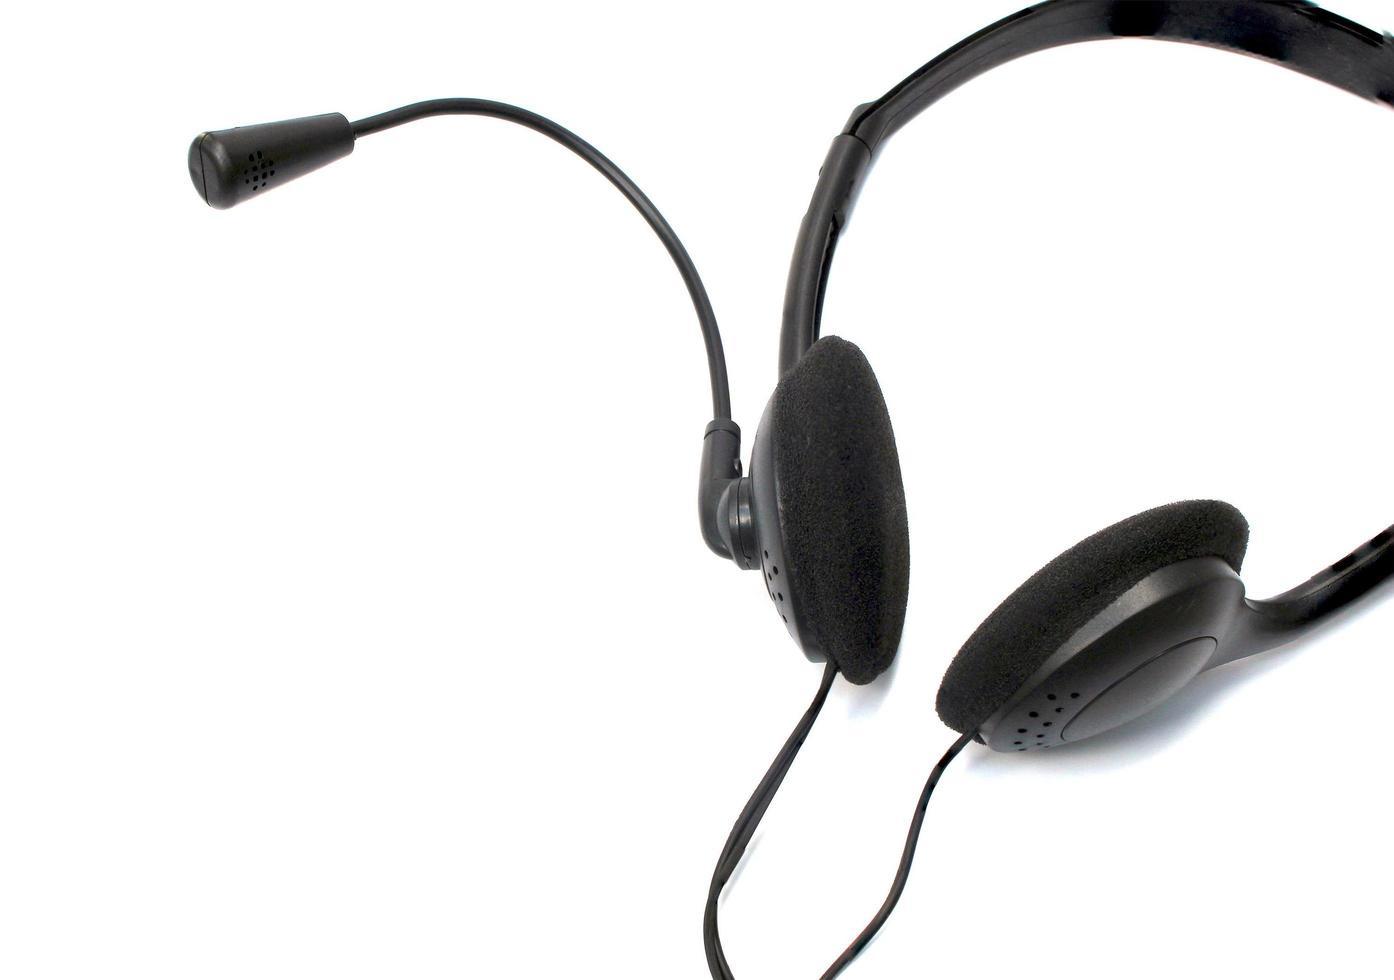 hoofdtelefoon met microfoon foto